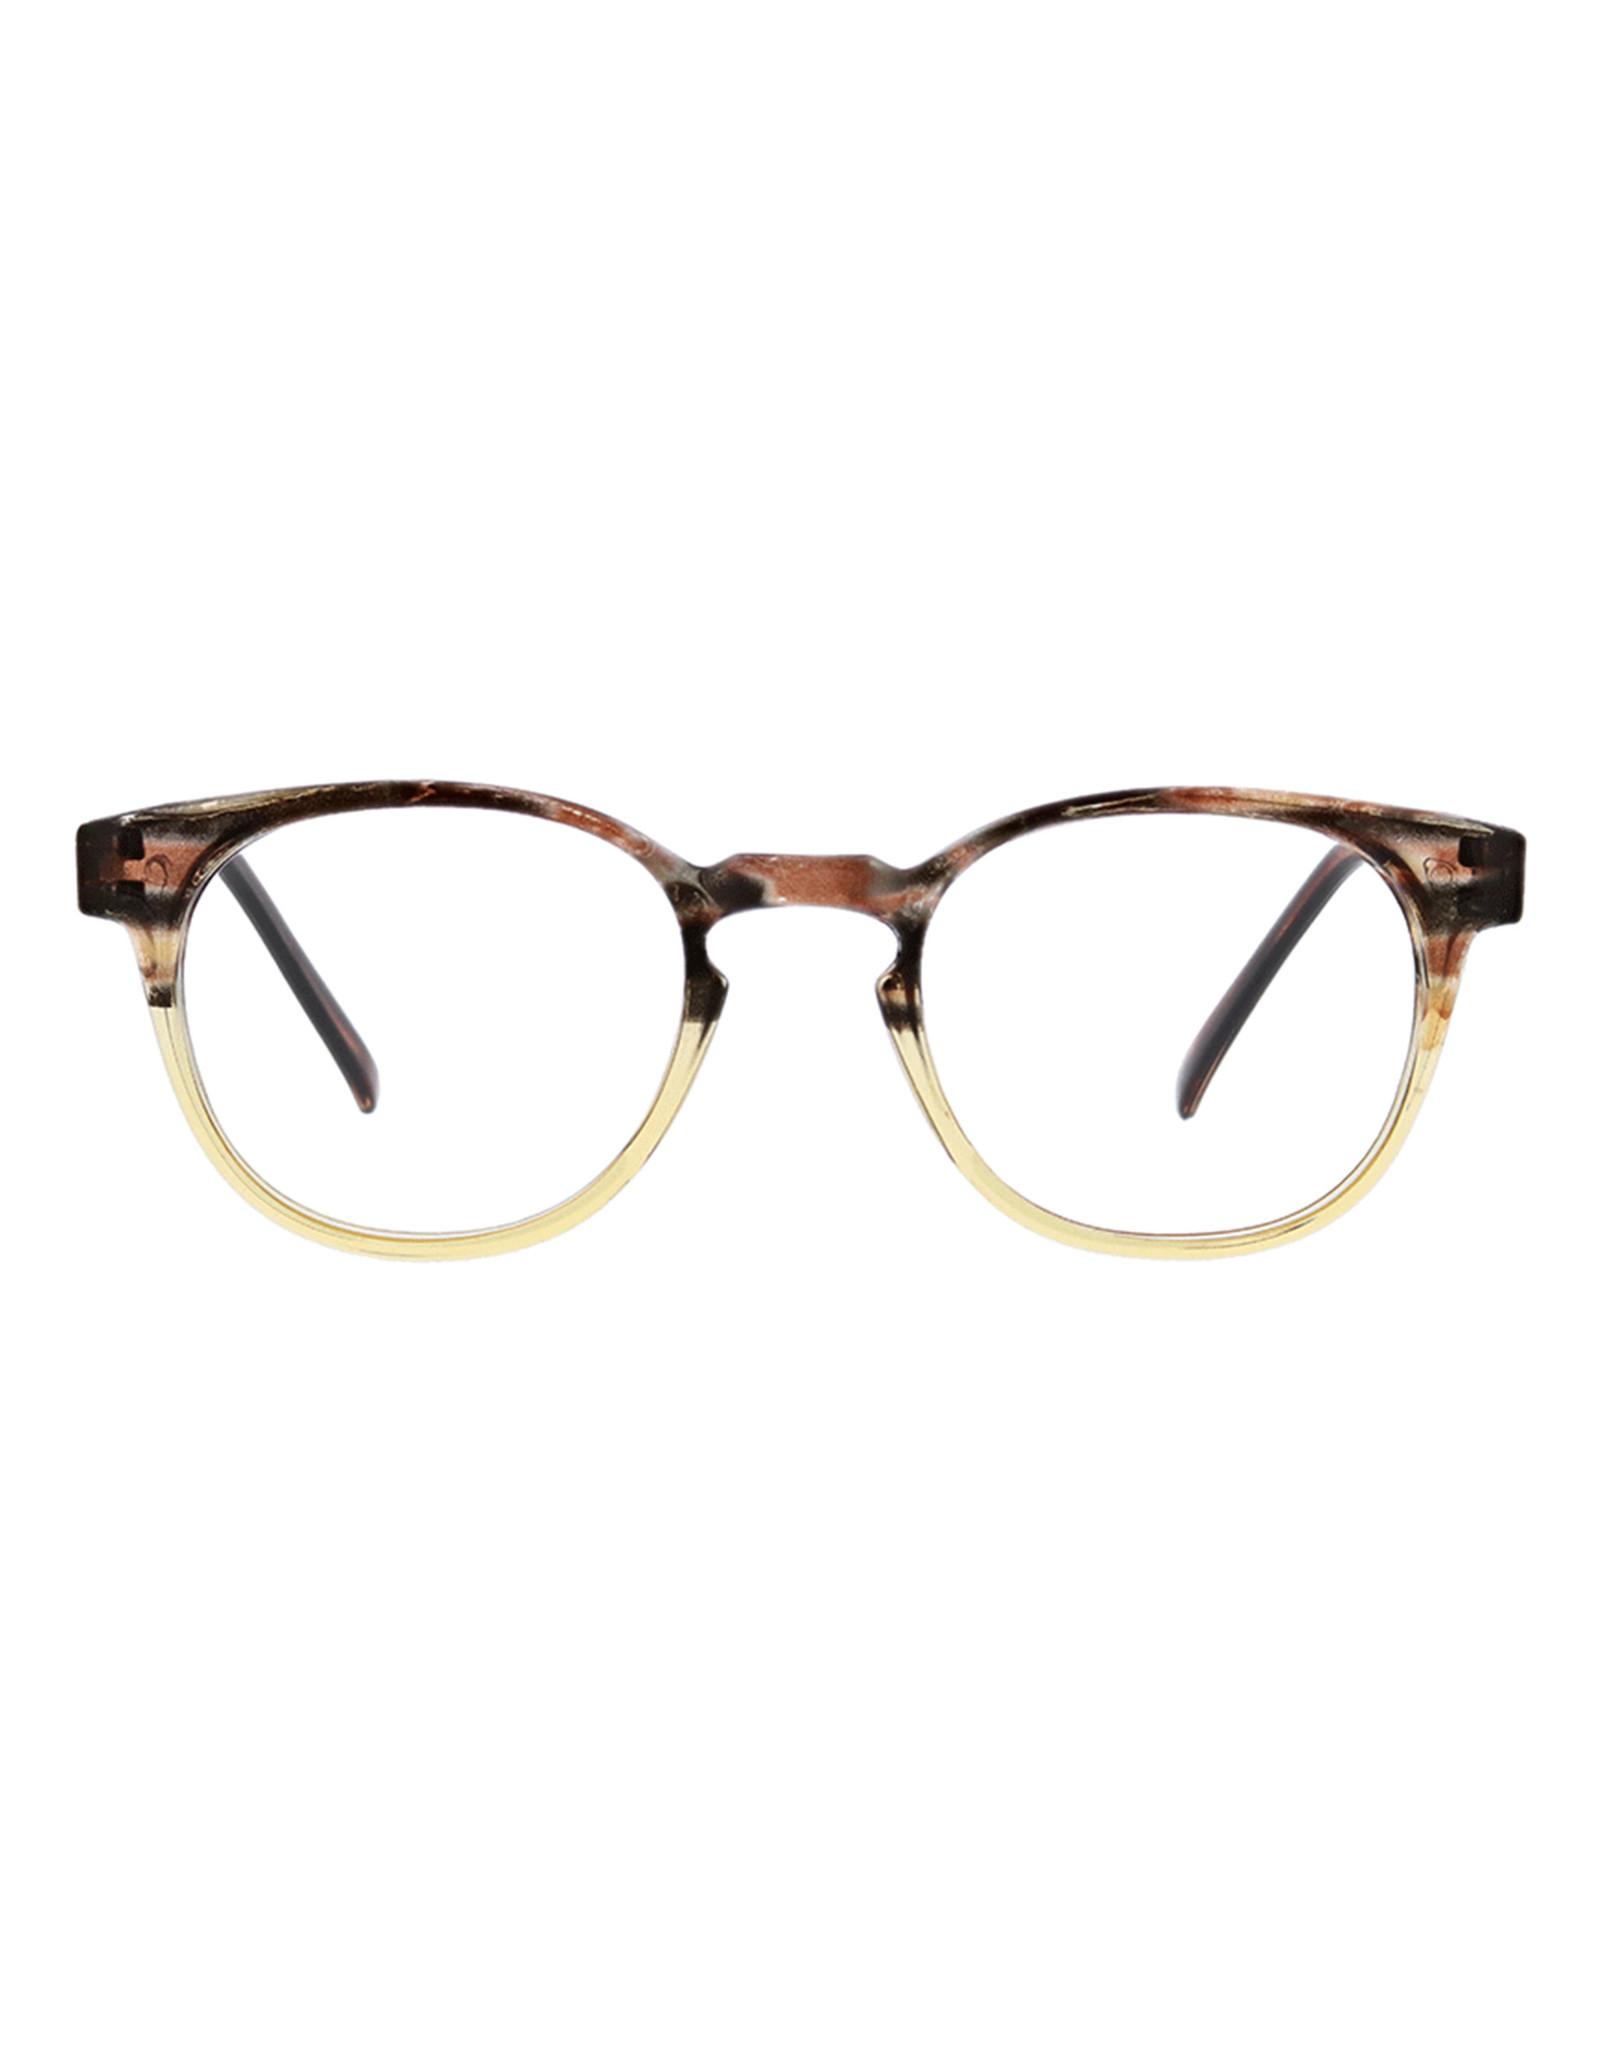 Peepers Dynomite - tan/brown +2.25